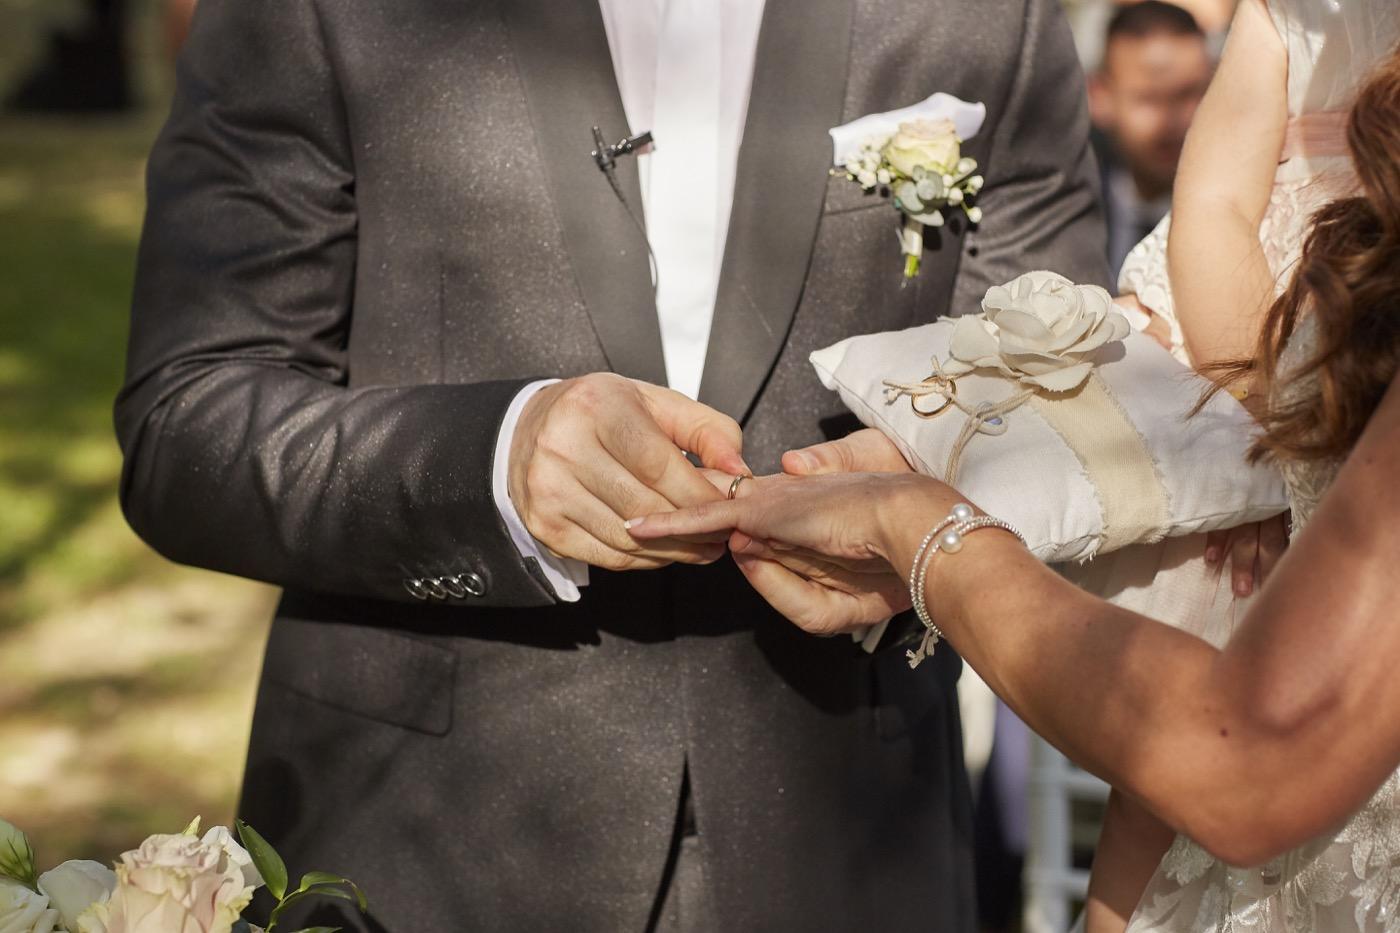 Claudio-Coppola-wedding-photographer-la-scuderia-eventi-preparativi-la-rosetta-perugia-57